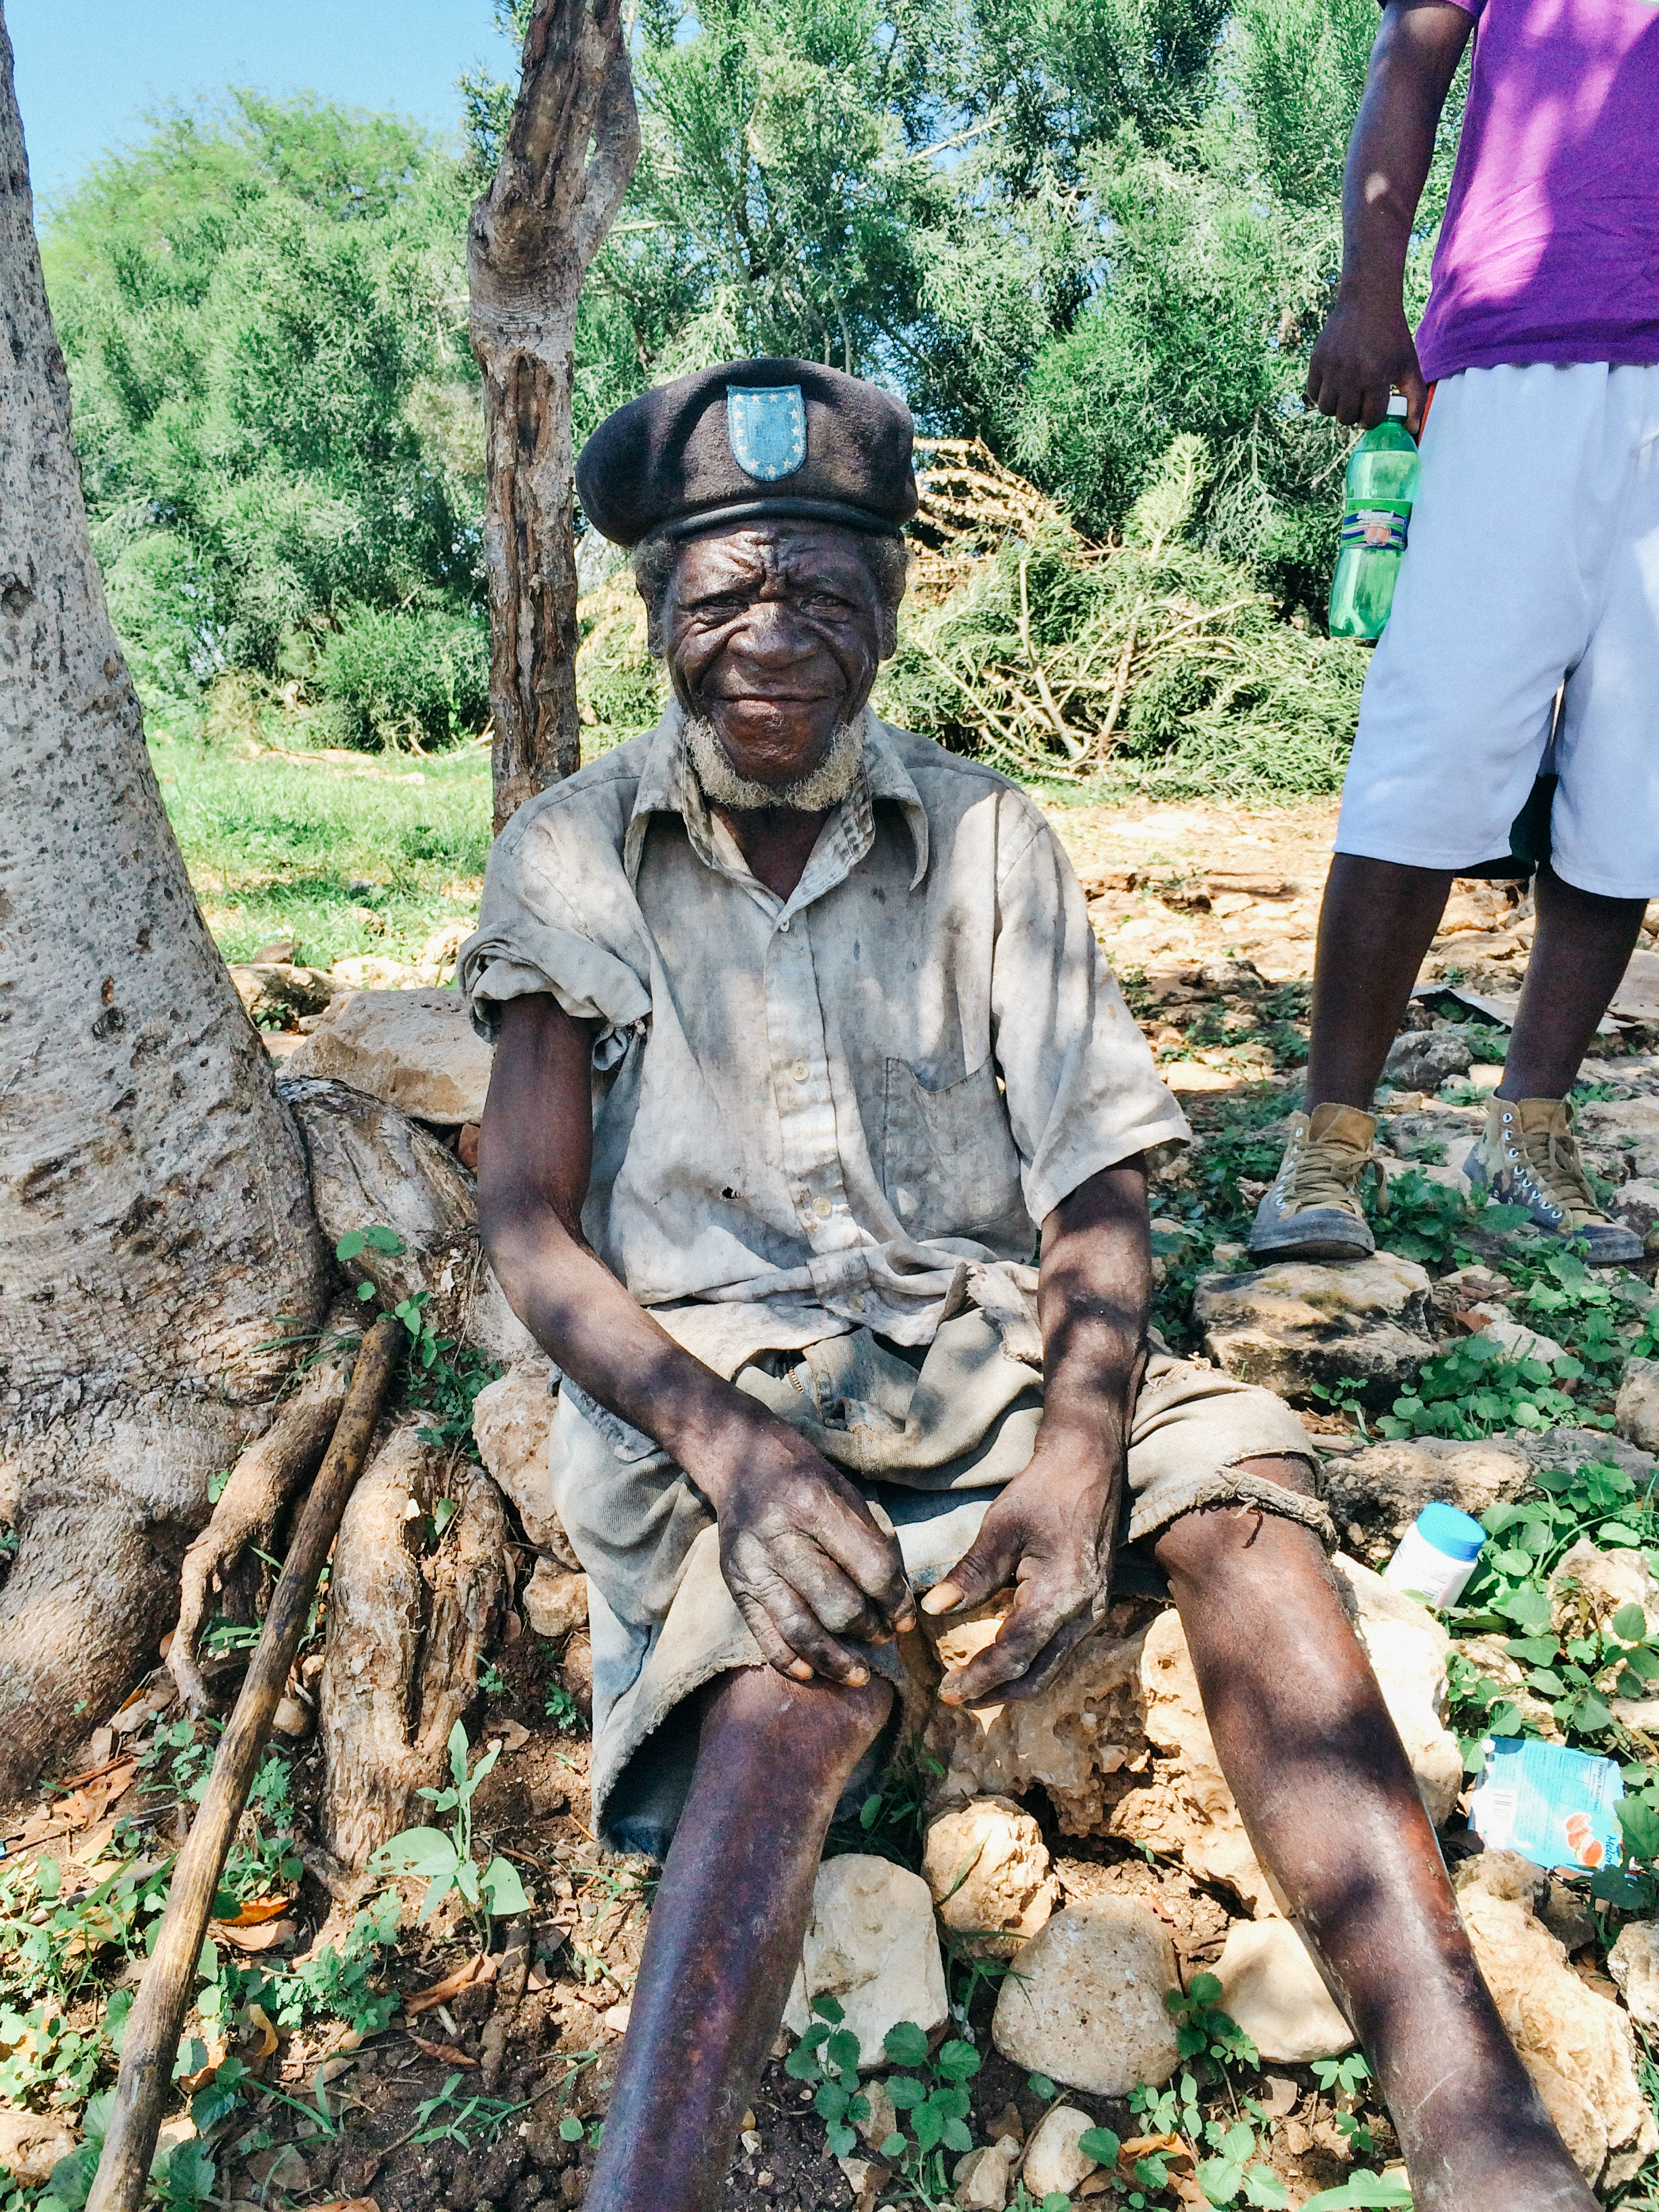 Haiti_Medical_missions_healthcare_healing_art_missions_03.JPG